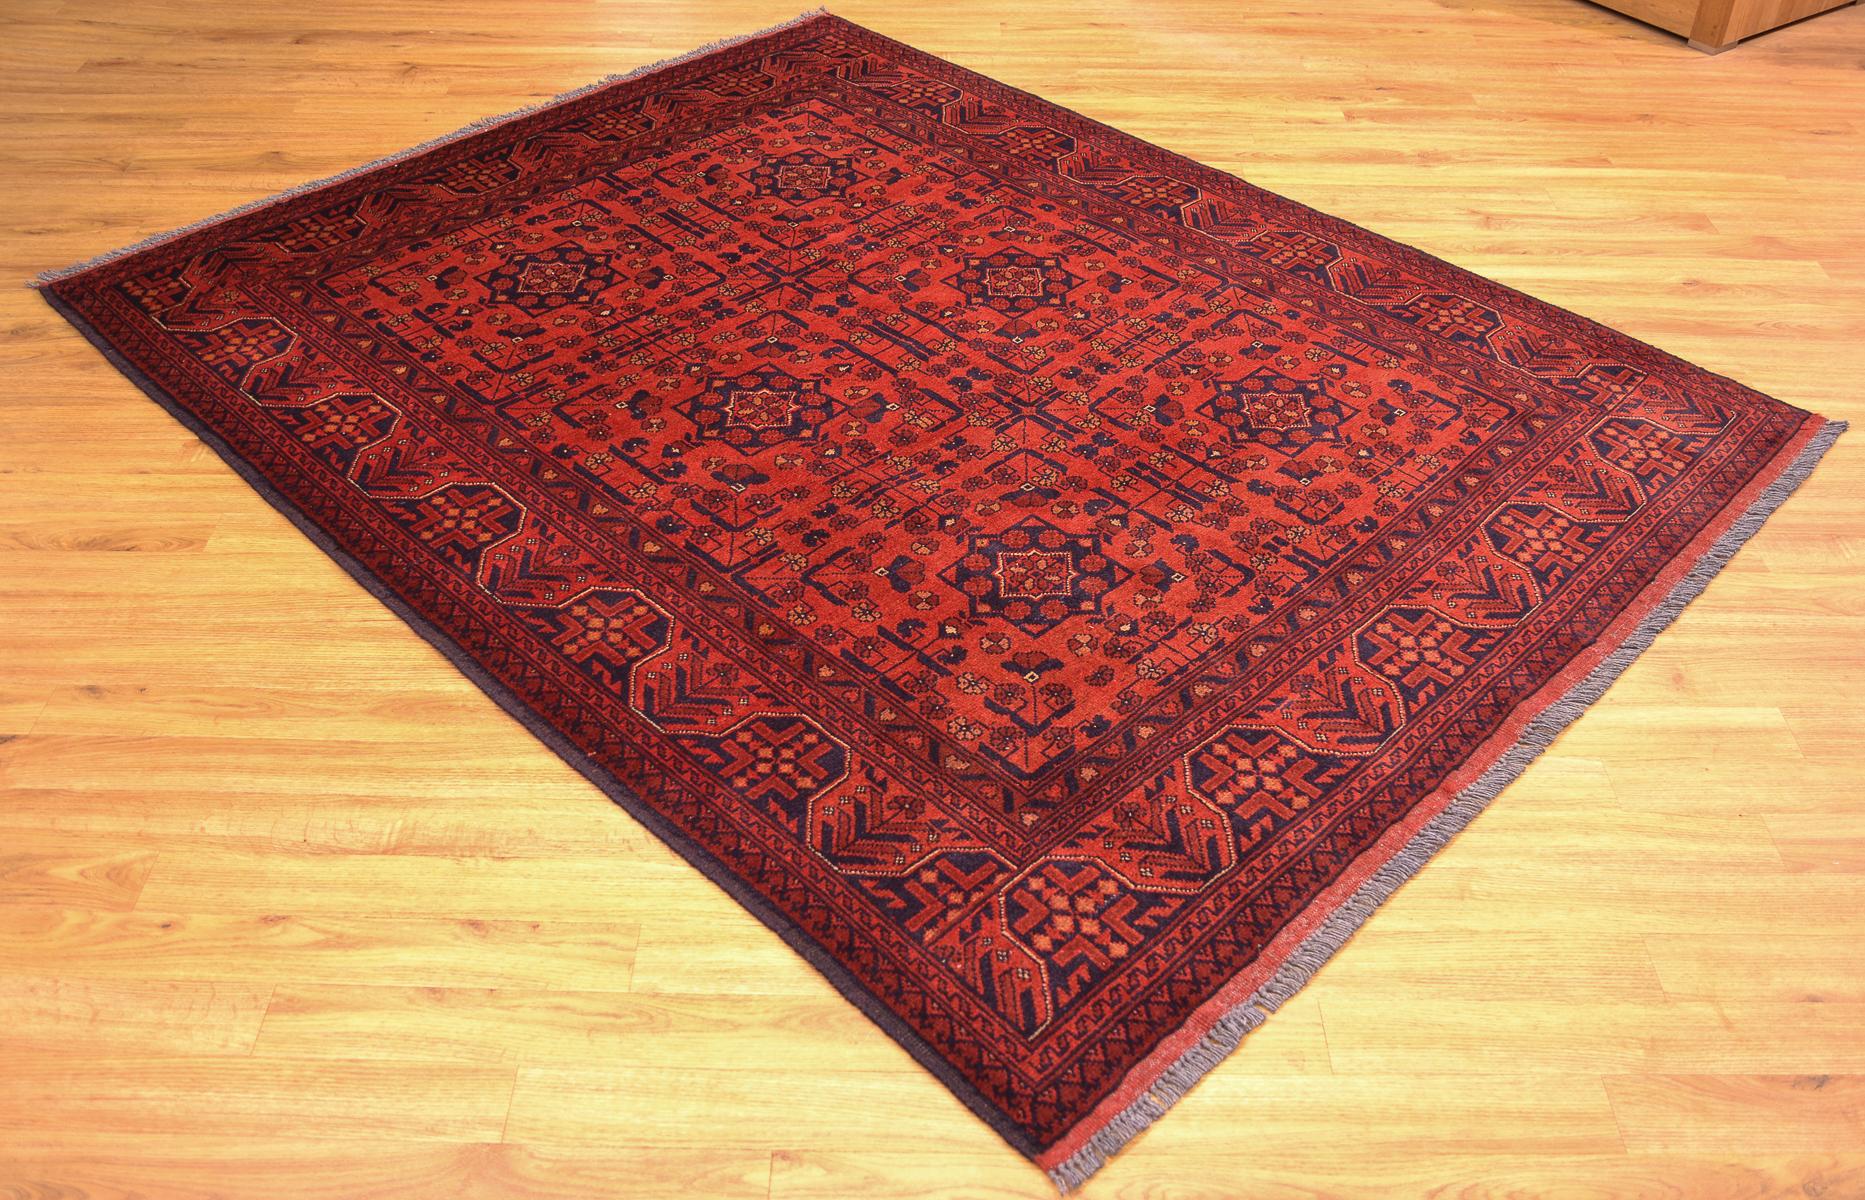 Khan Mohamadi Rug 1 94x1 52m The Oriental Rug Merchant